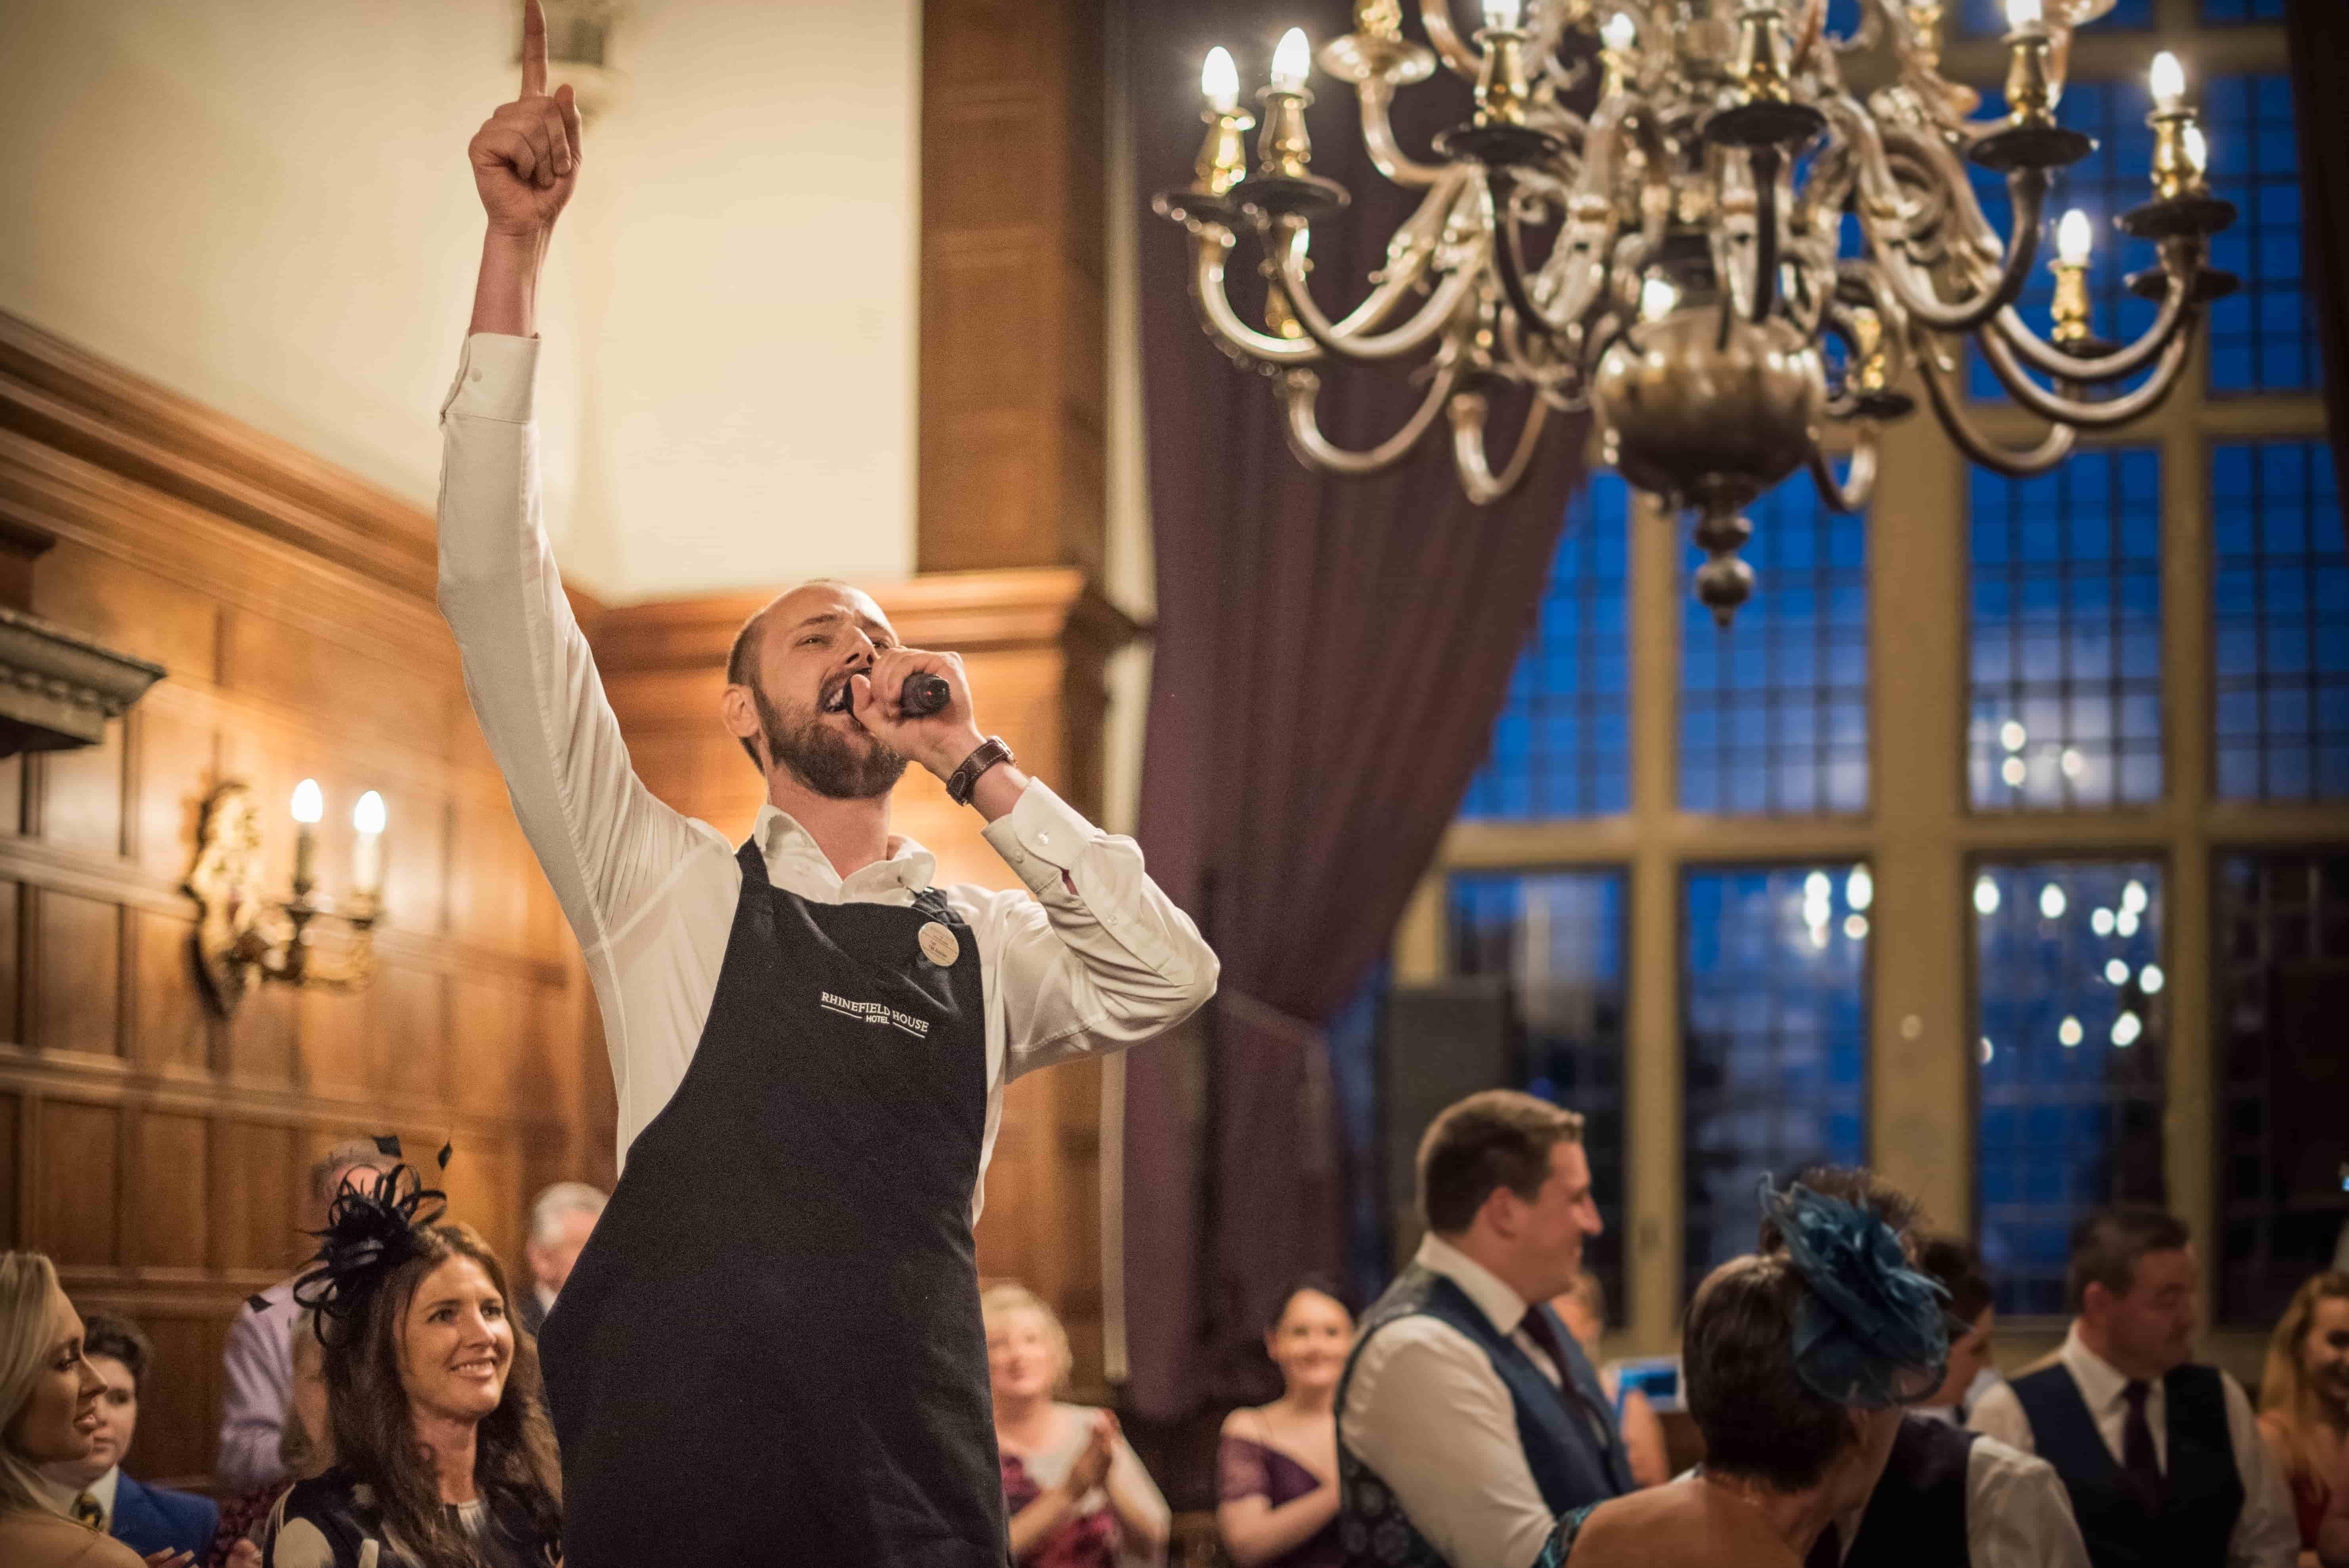 Singing Waiters at wedding